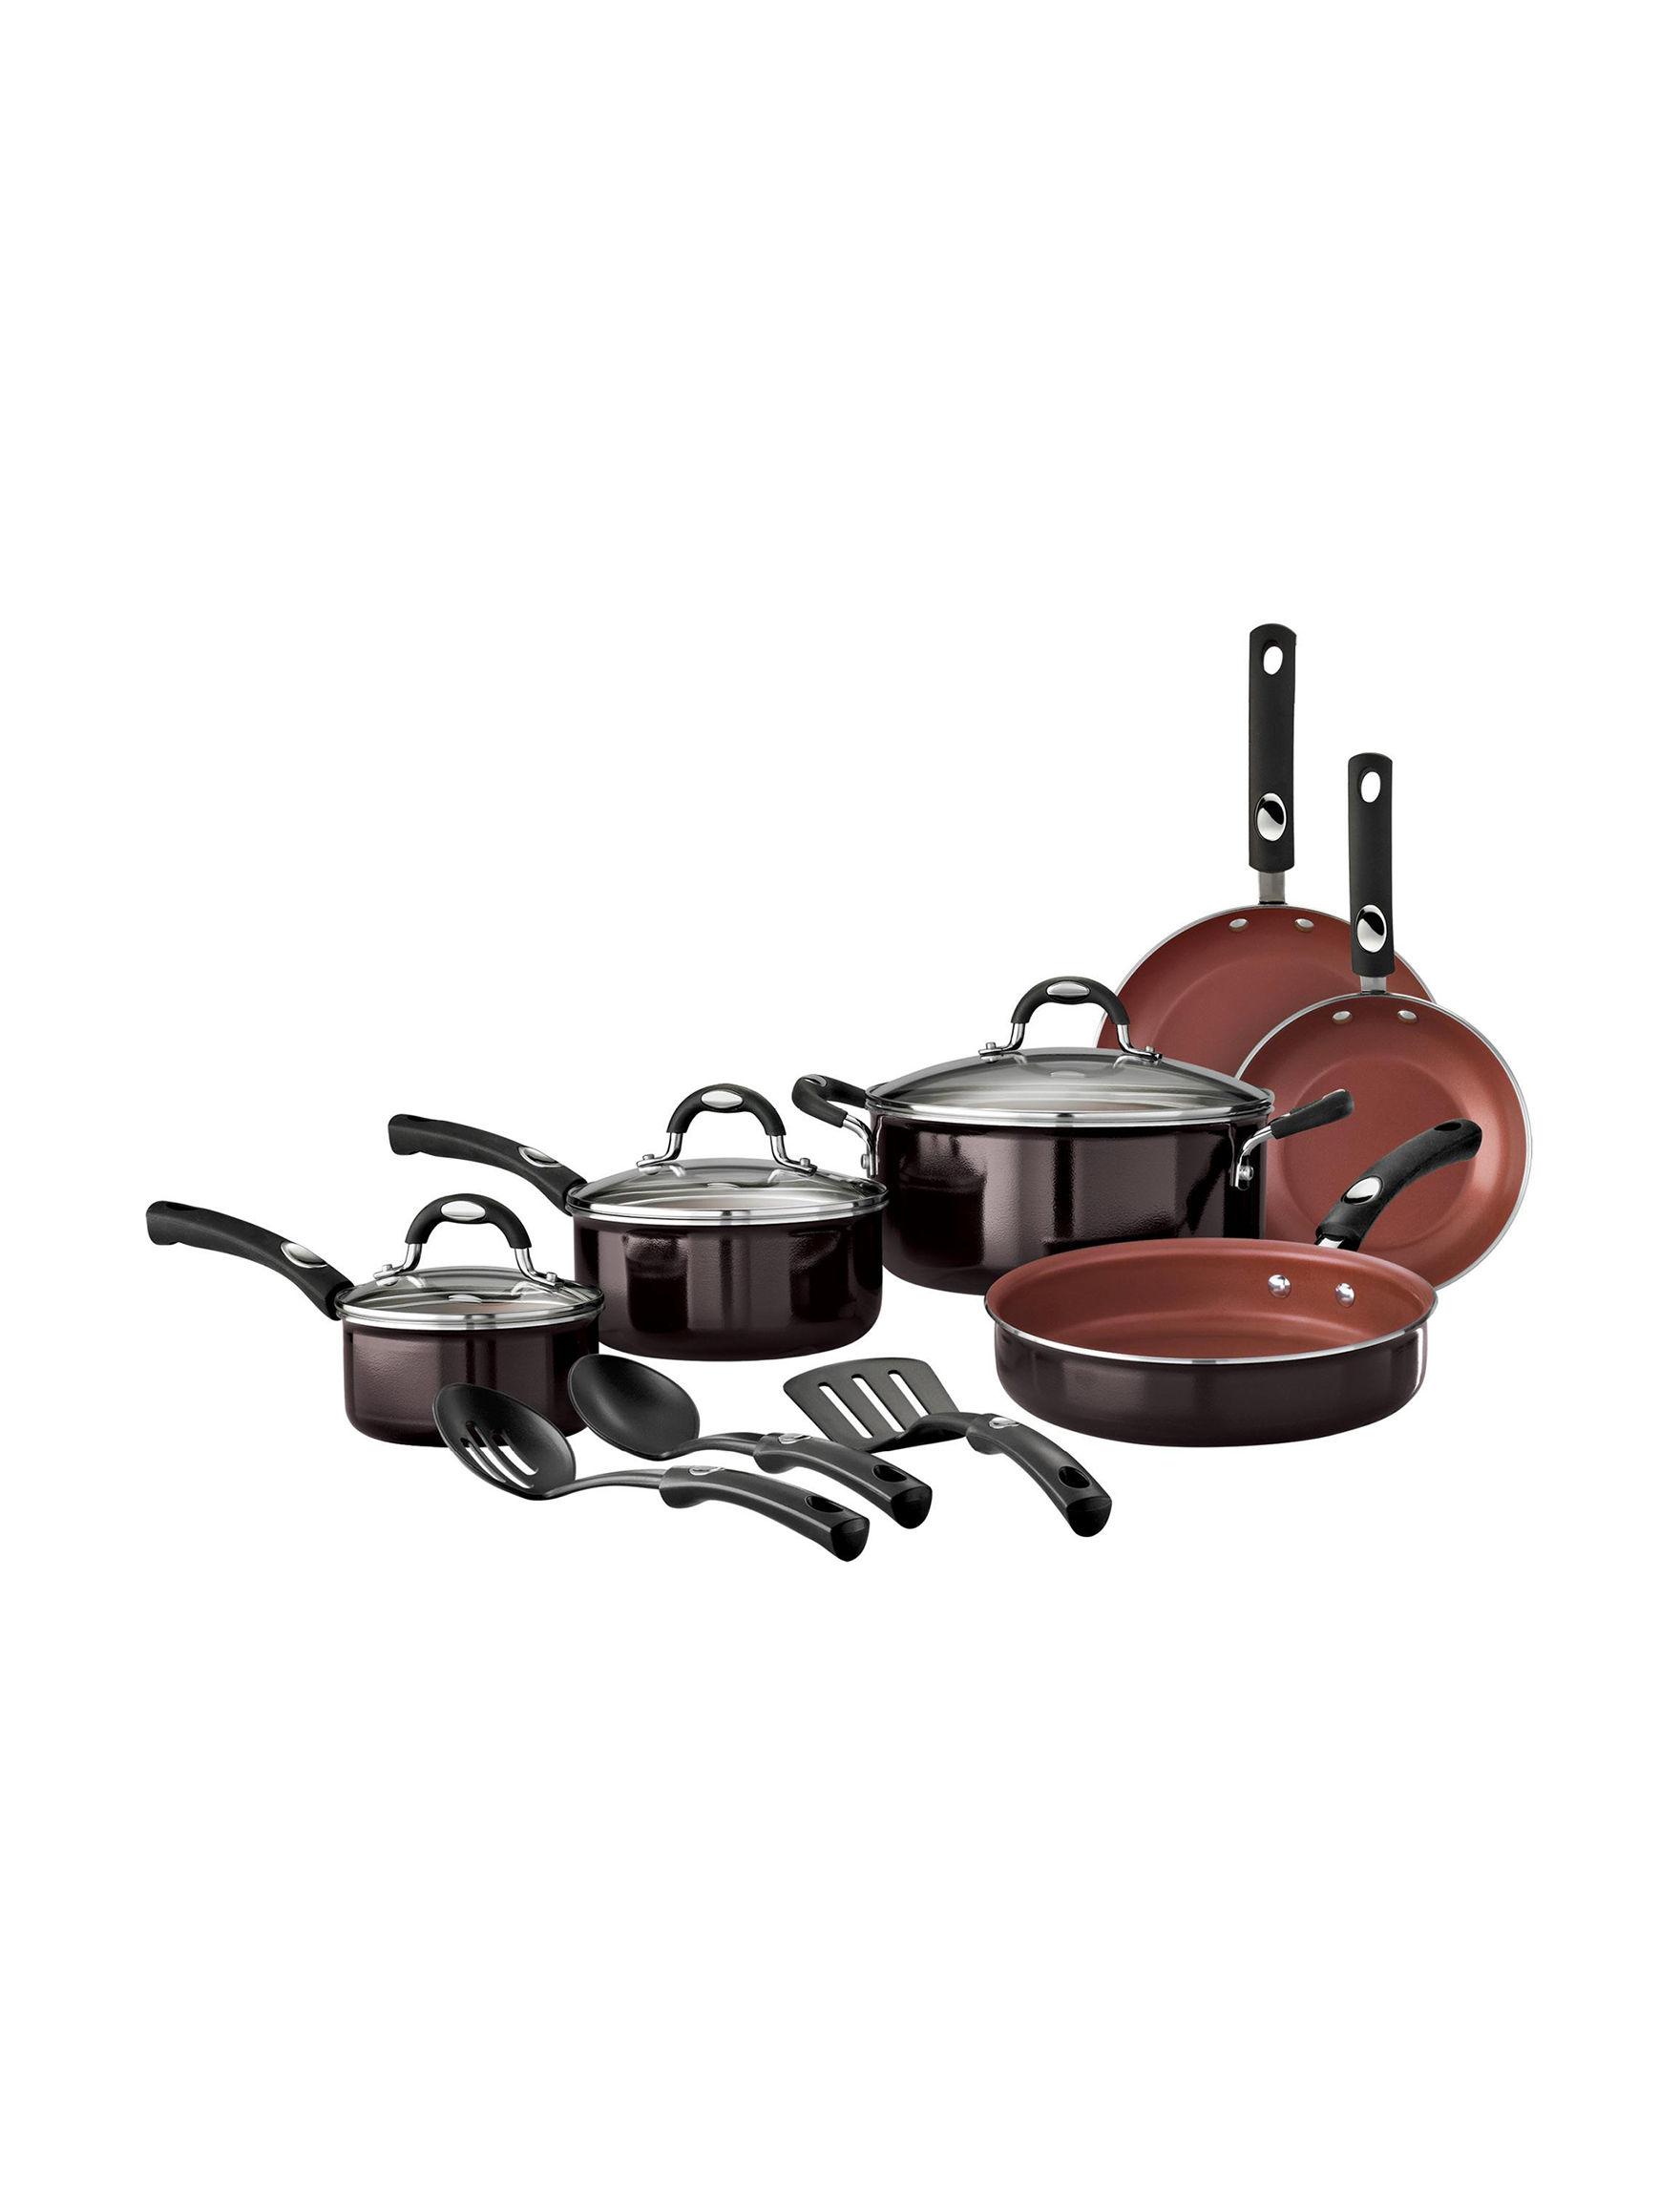 Tramontina Black Cherry Cookware Sets Cookware